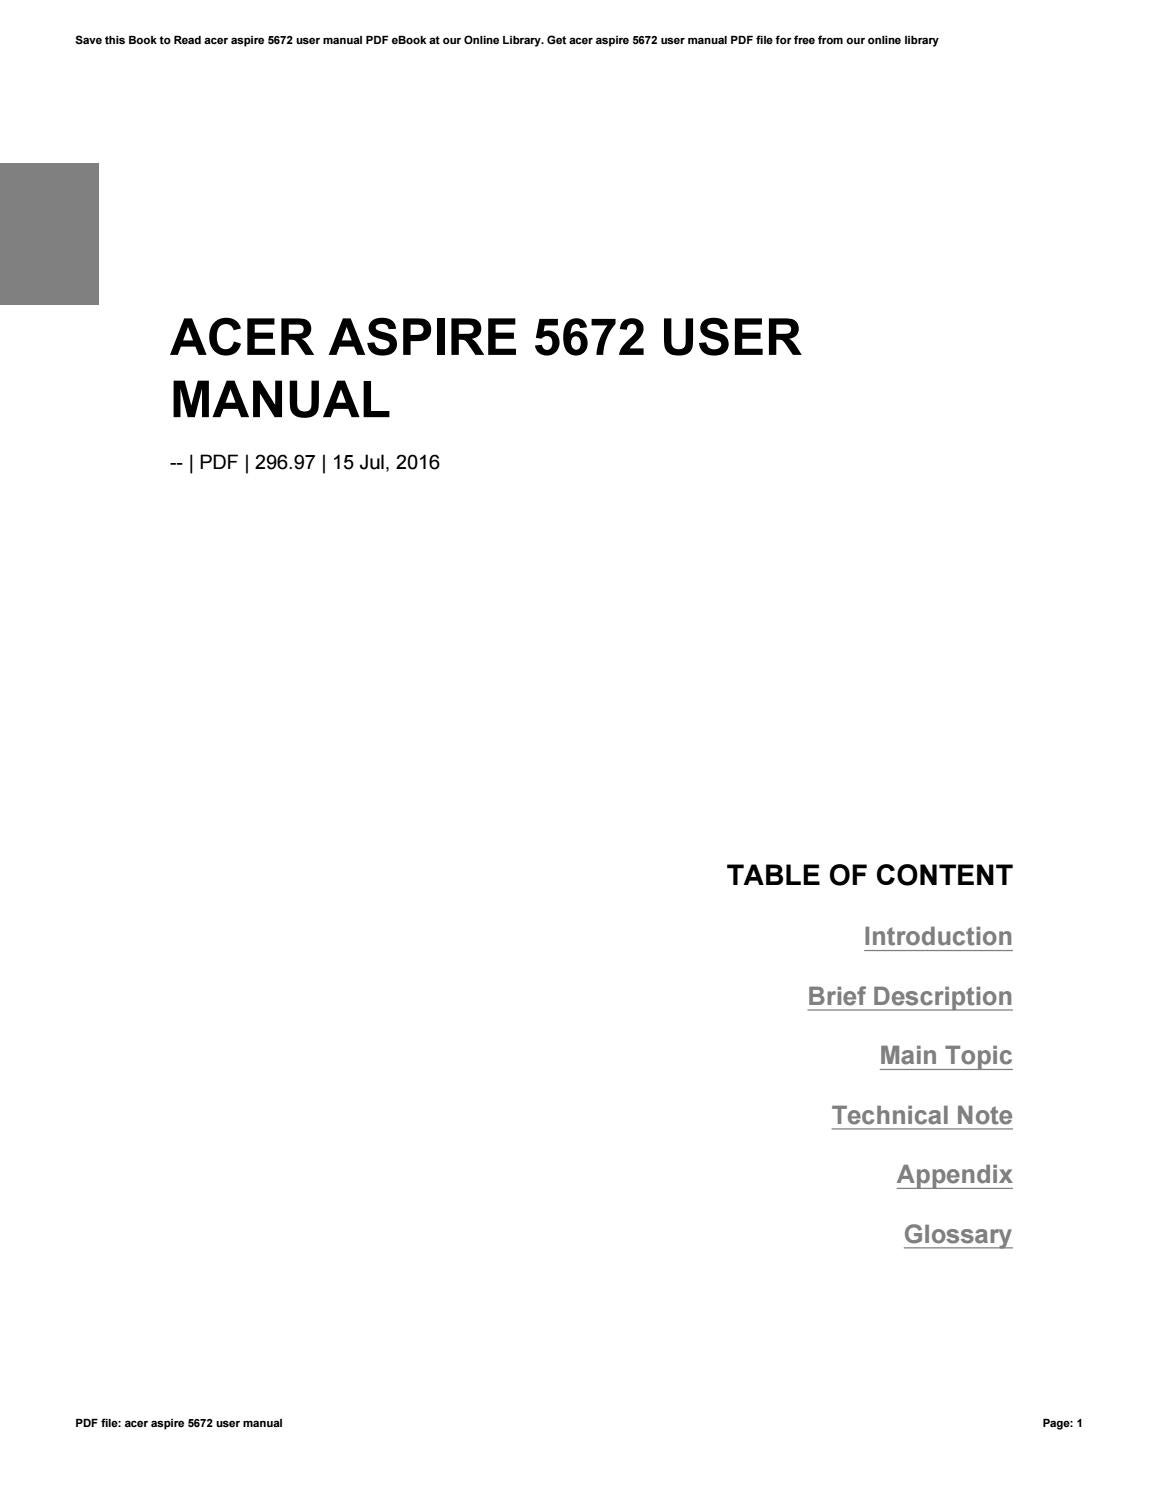 Acer v5 manual ebook ebook mollysme array acer p5207b introduction manual pdf download psychologyarticles info rh psychologyarticles info fandeluxe Images